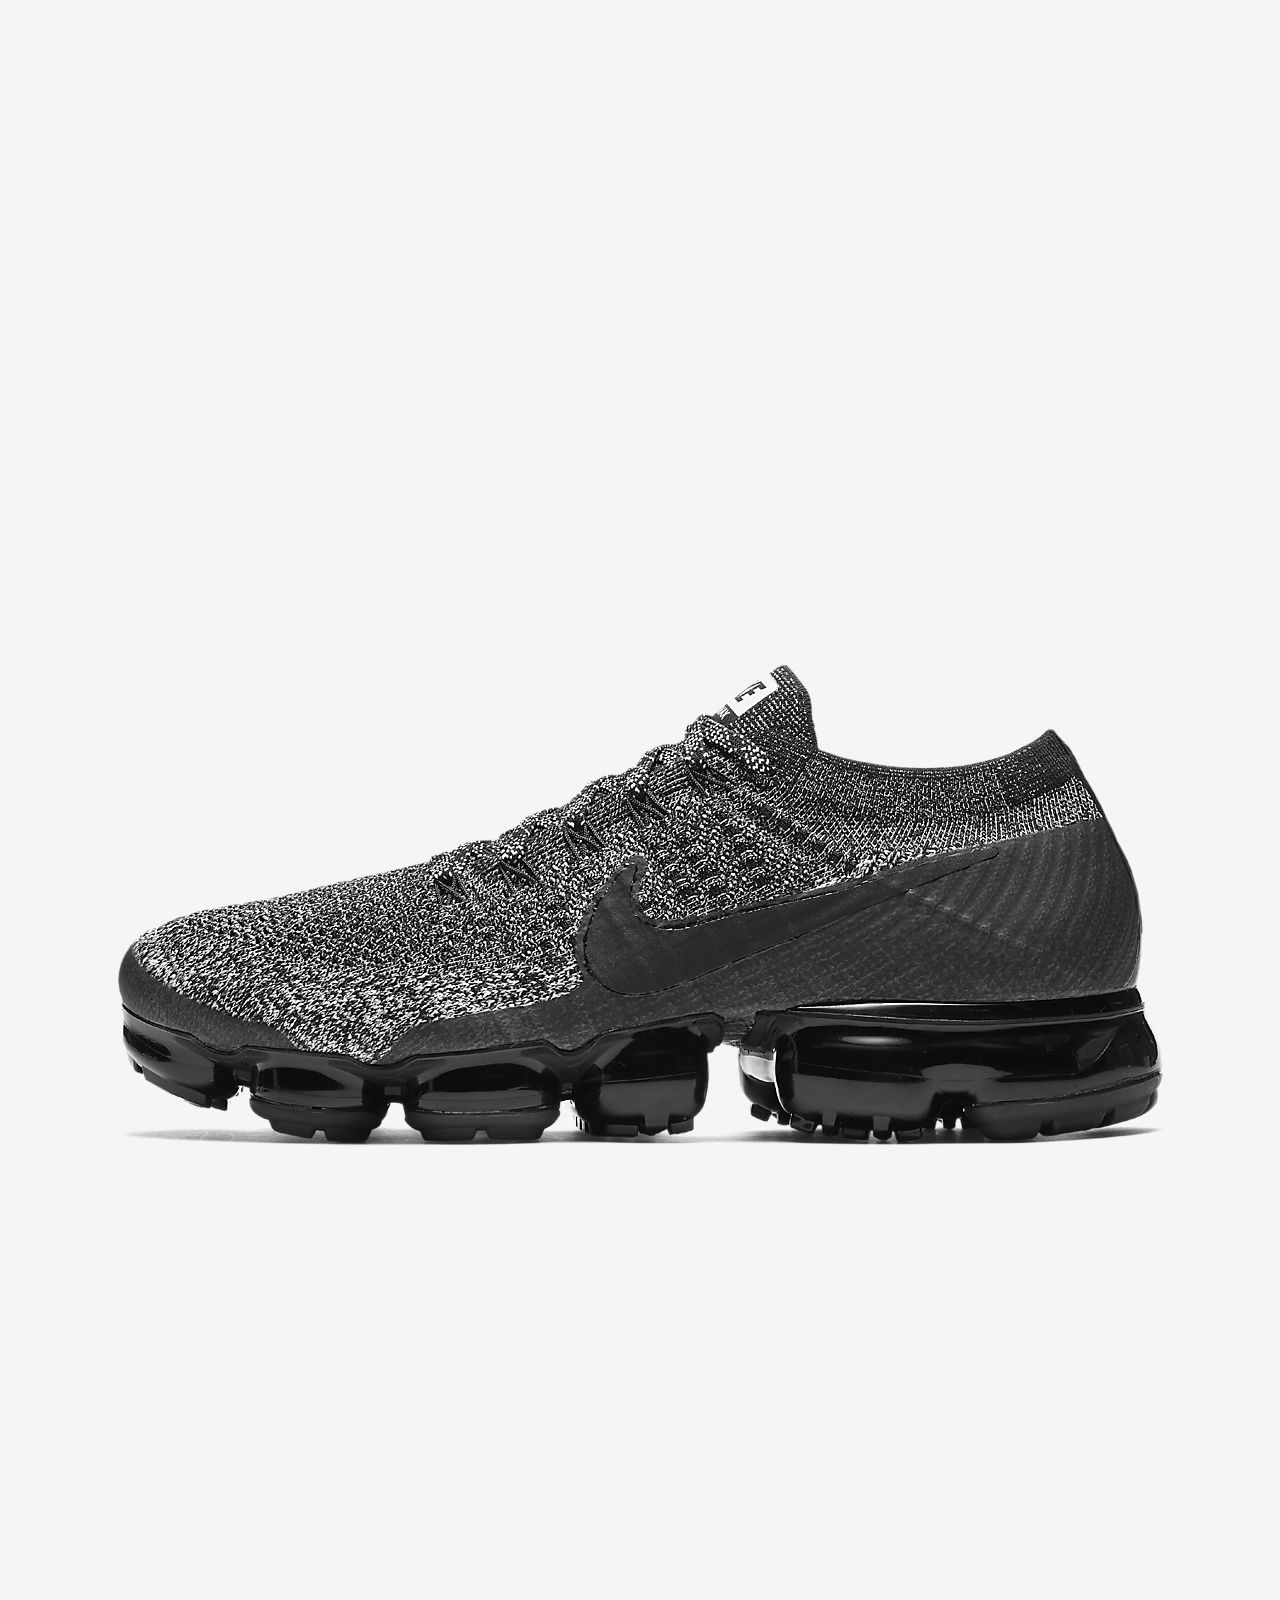 2018 Nike Air Vapor Max negro